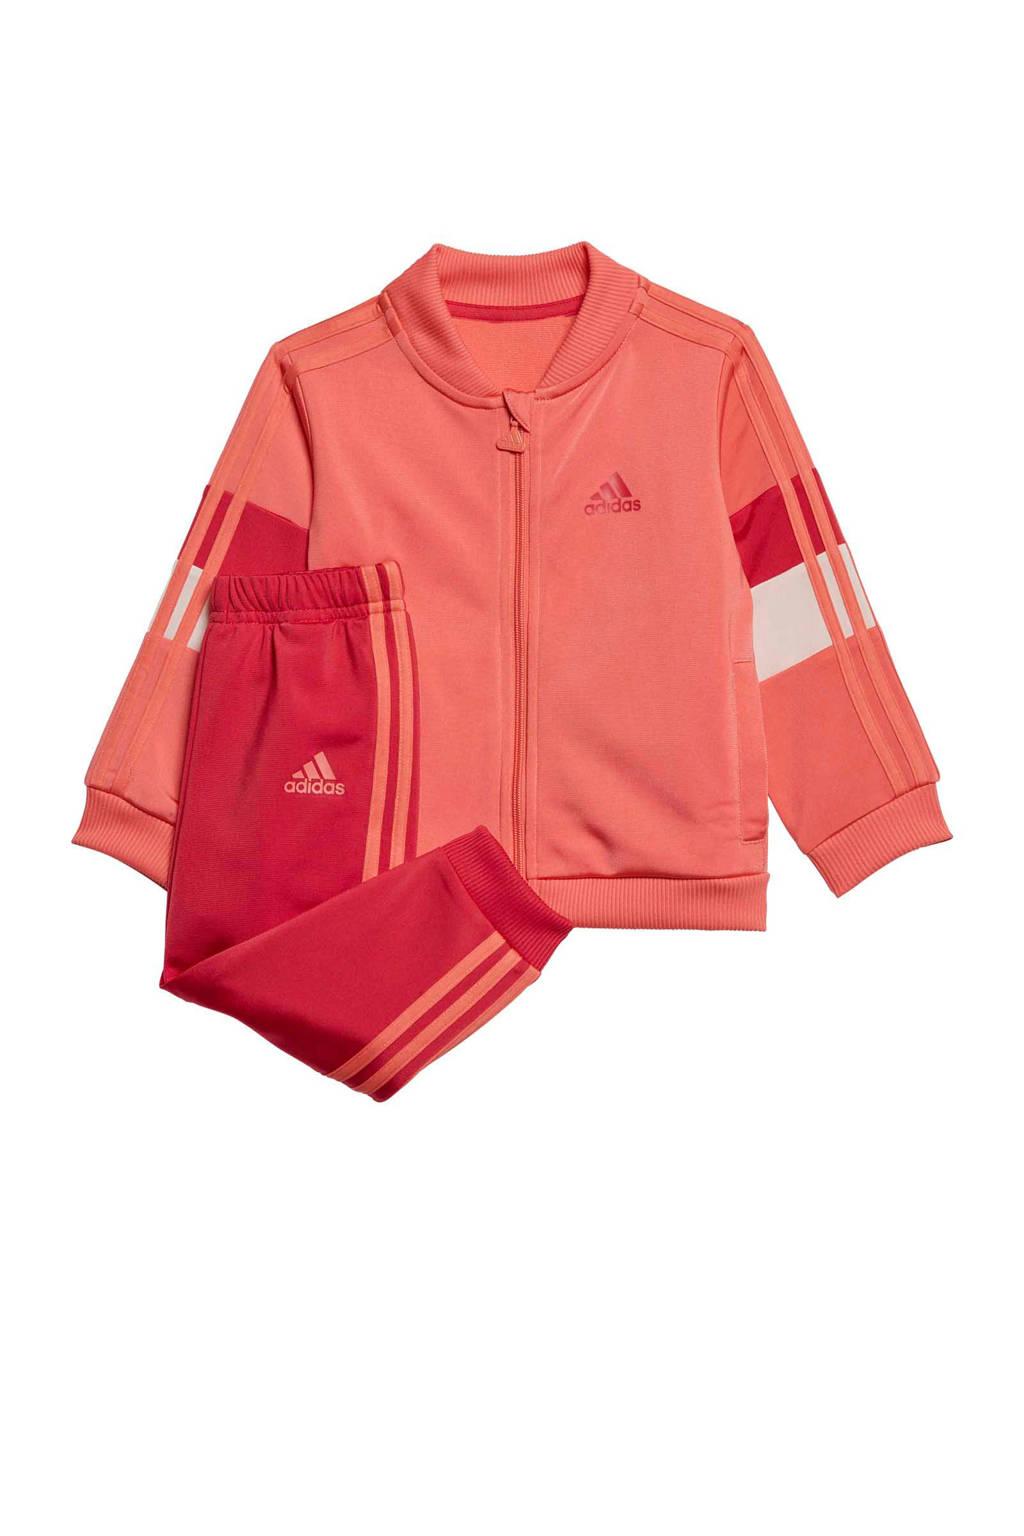 adidas Performance   trainingspak oudroze/rood, Oudroze/rood